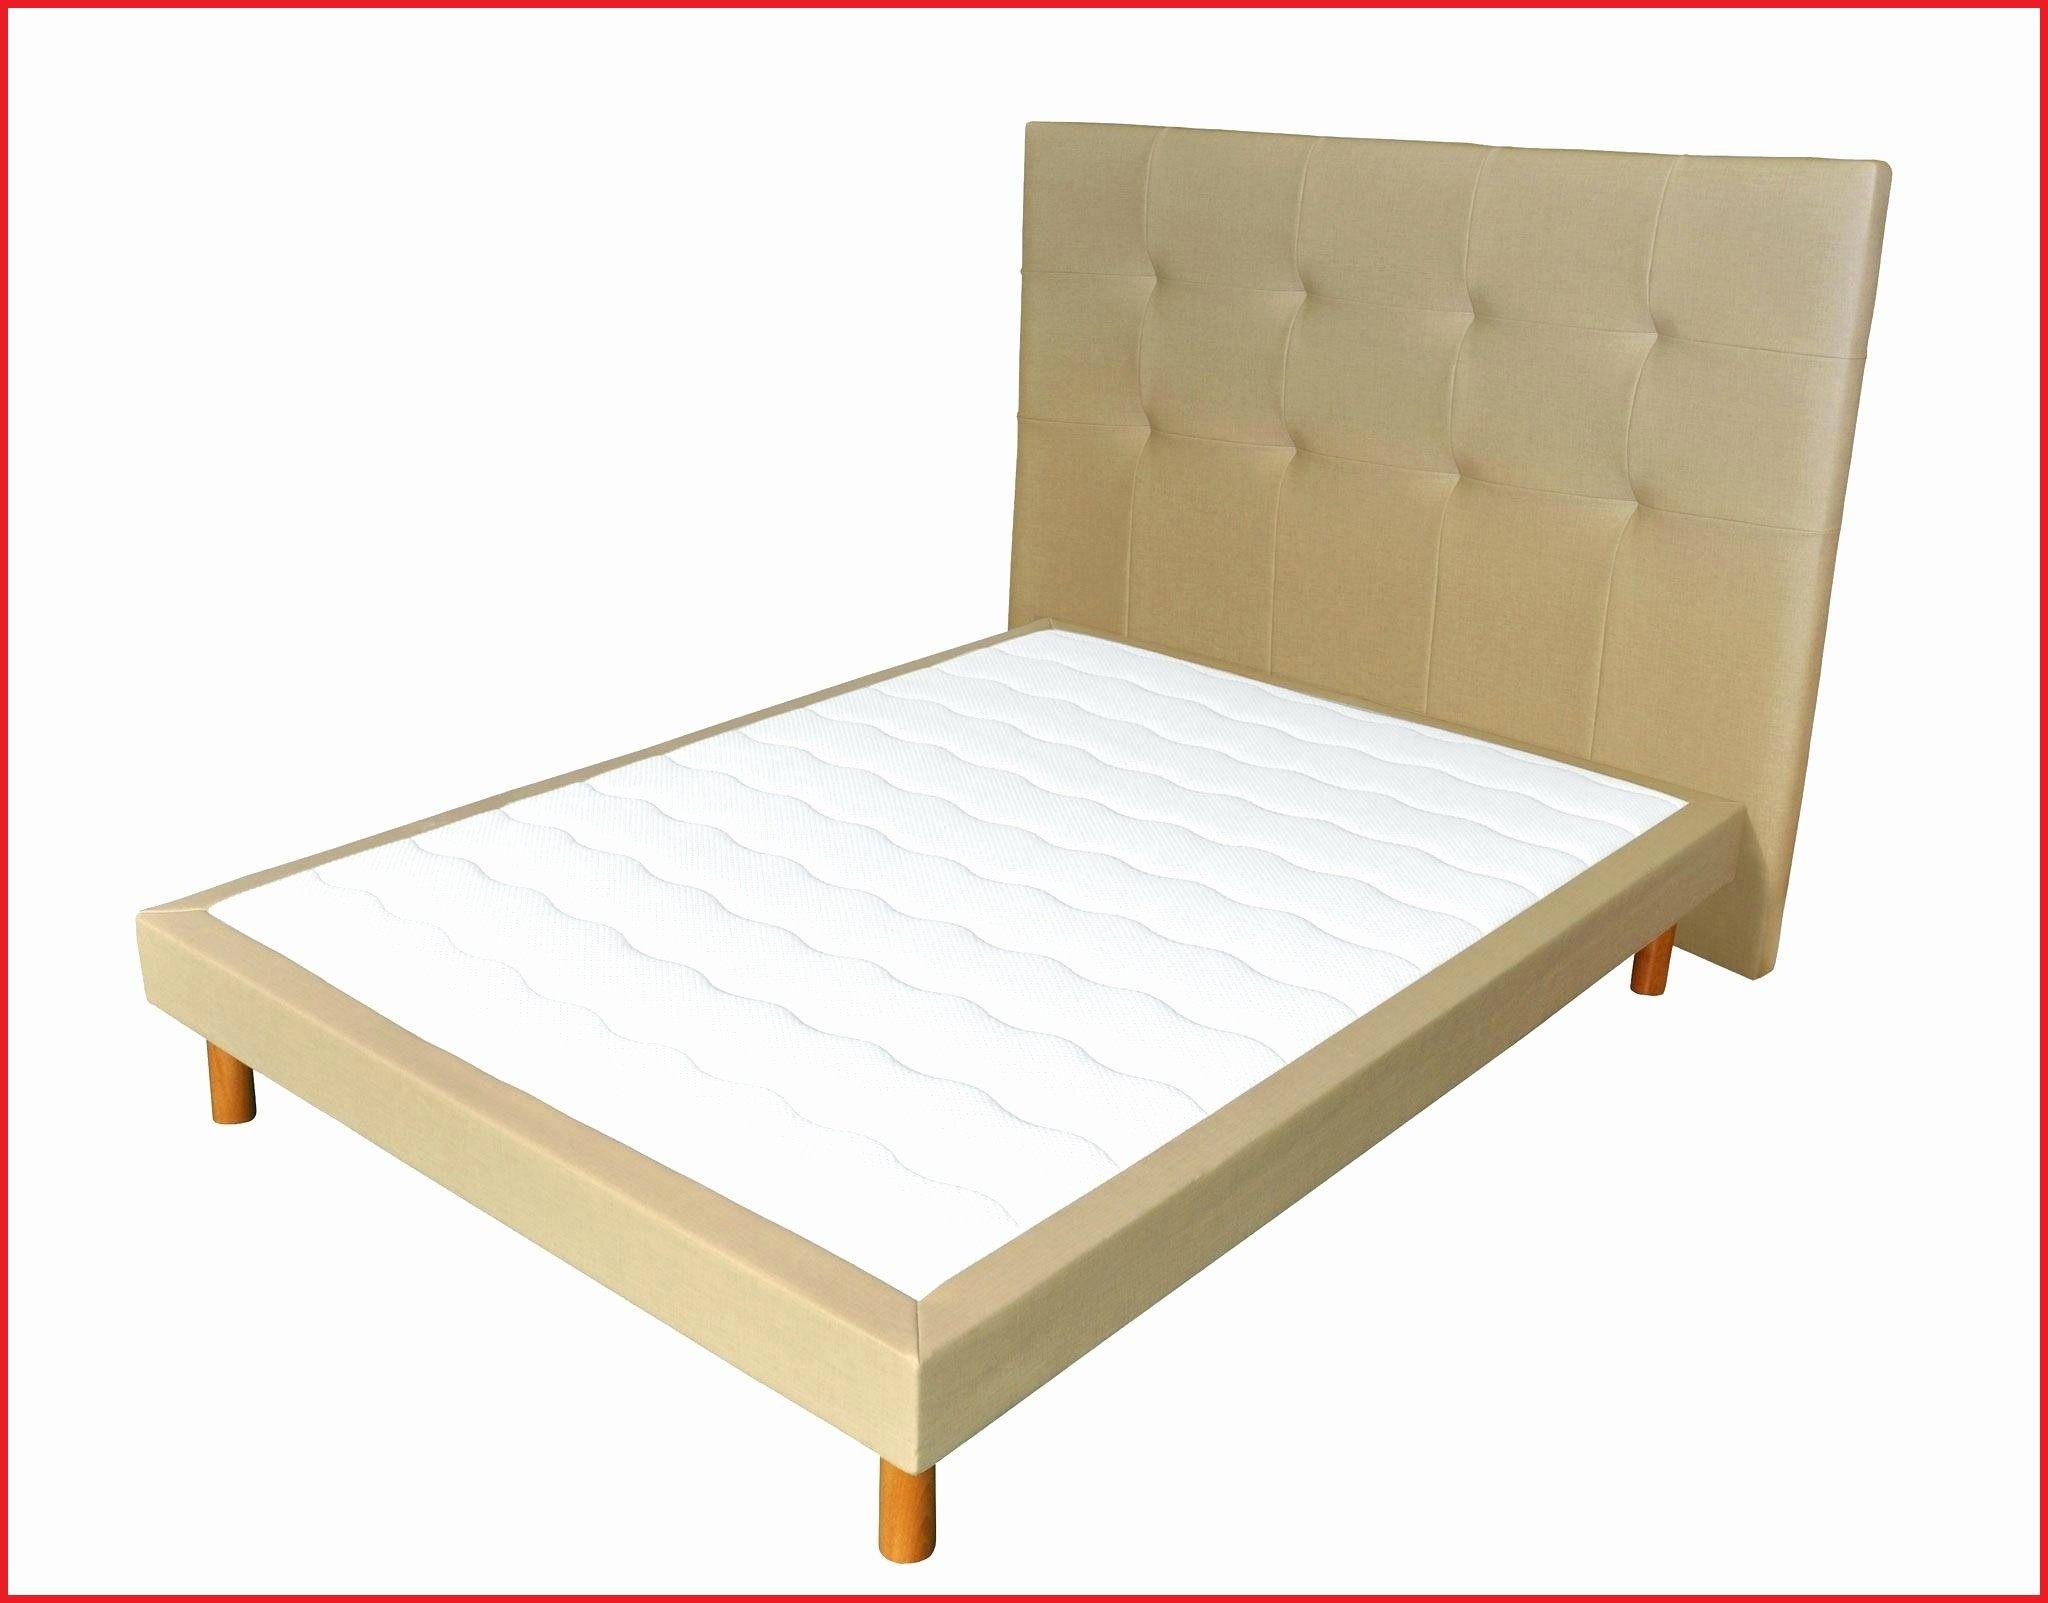 Ikea Lit Coffre 160 Meilleur De Lit Peigne Ikea